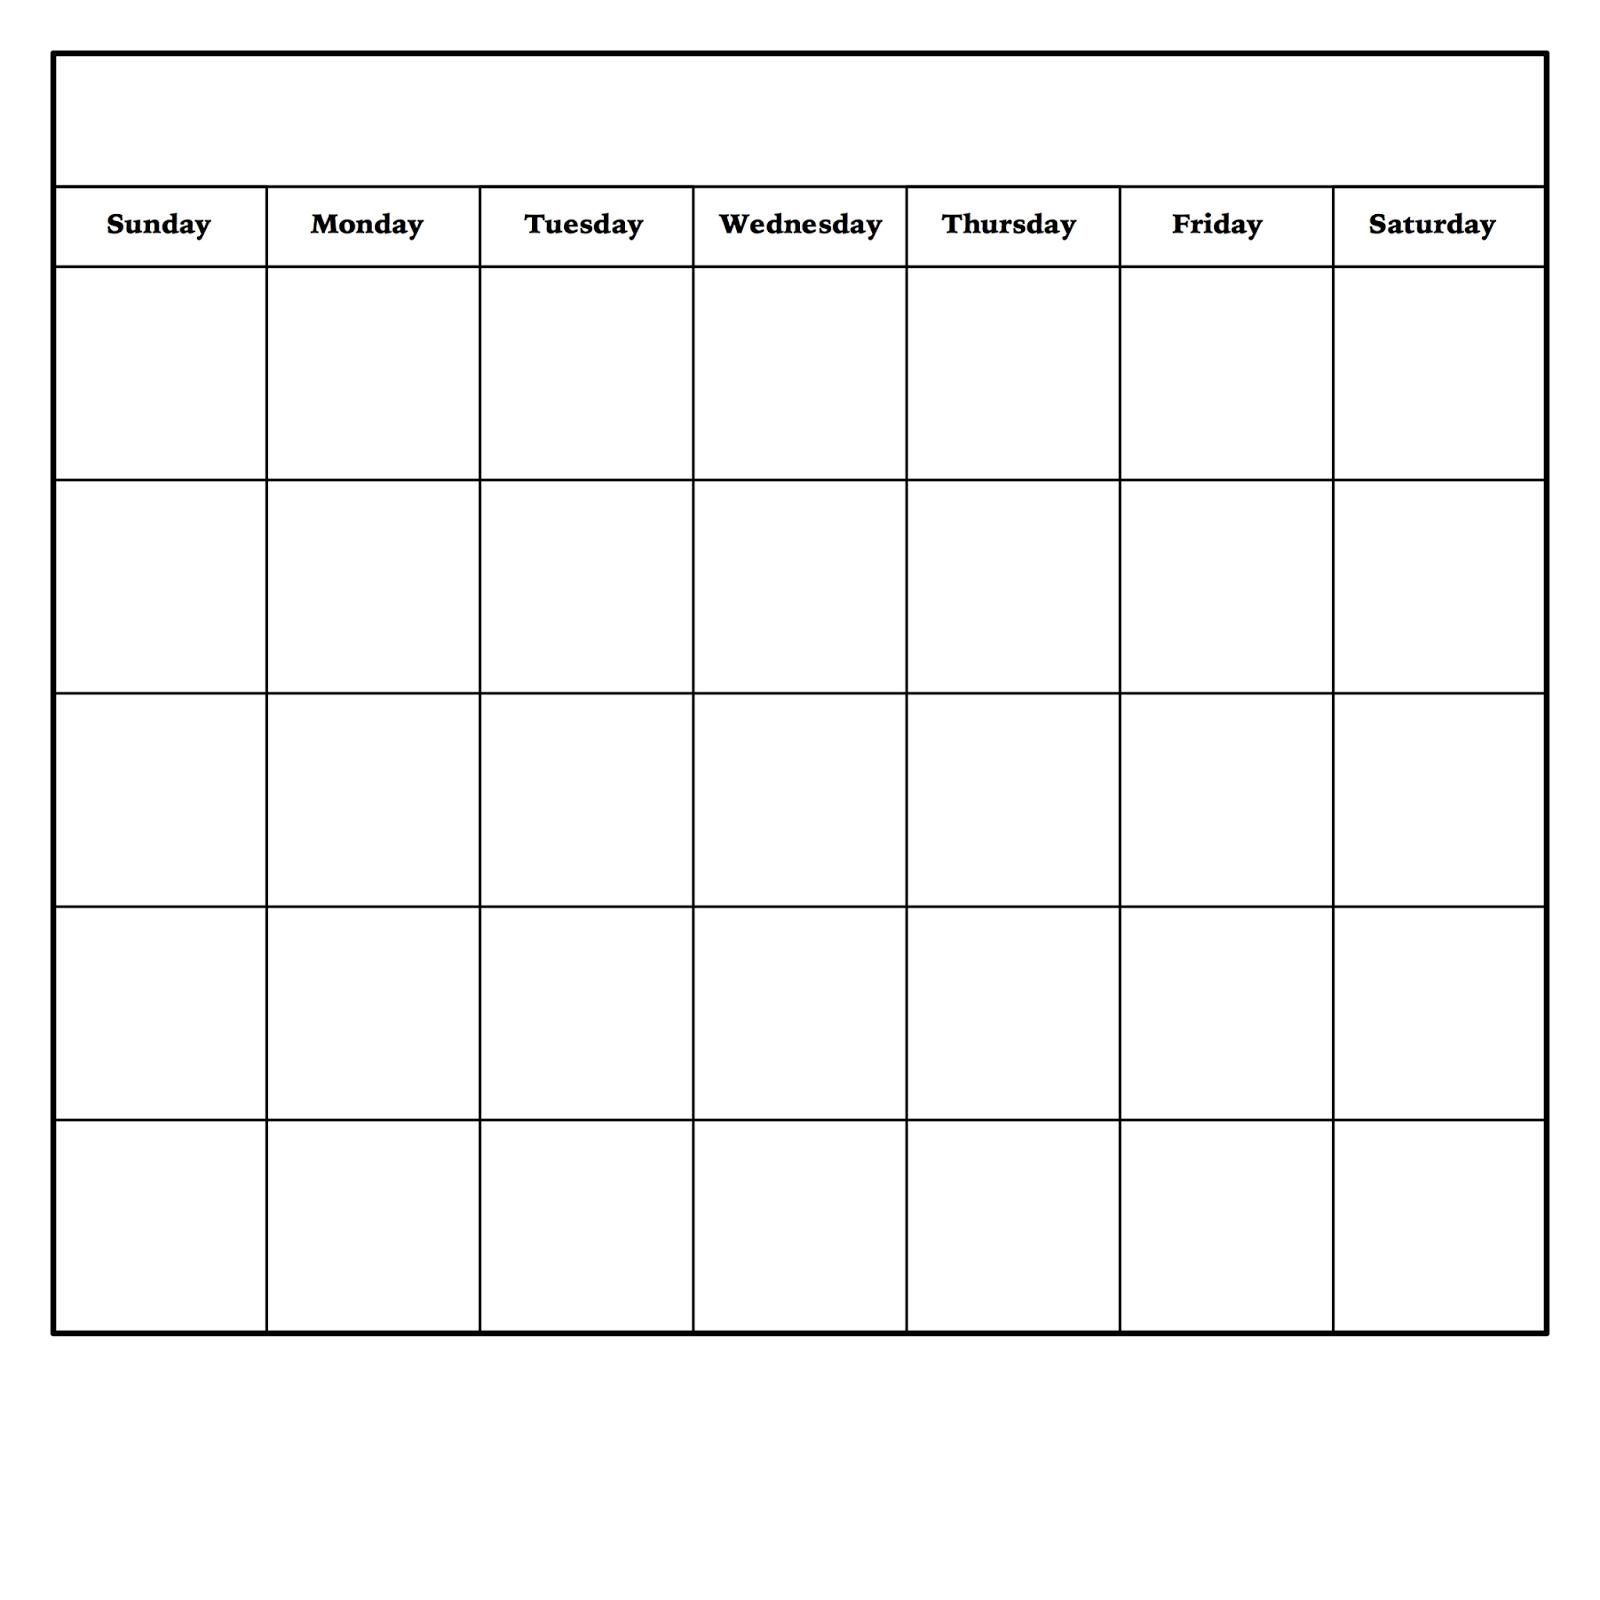 Diy Dry Erase Calendar | Monthly Calendar Template, Blank